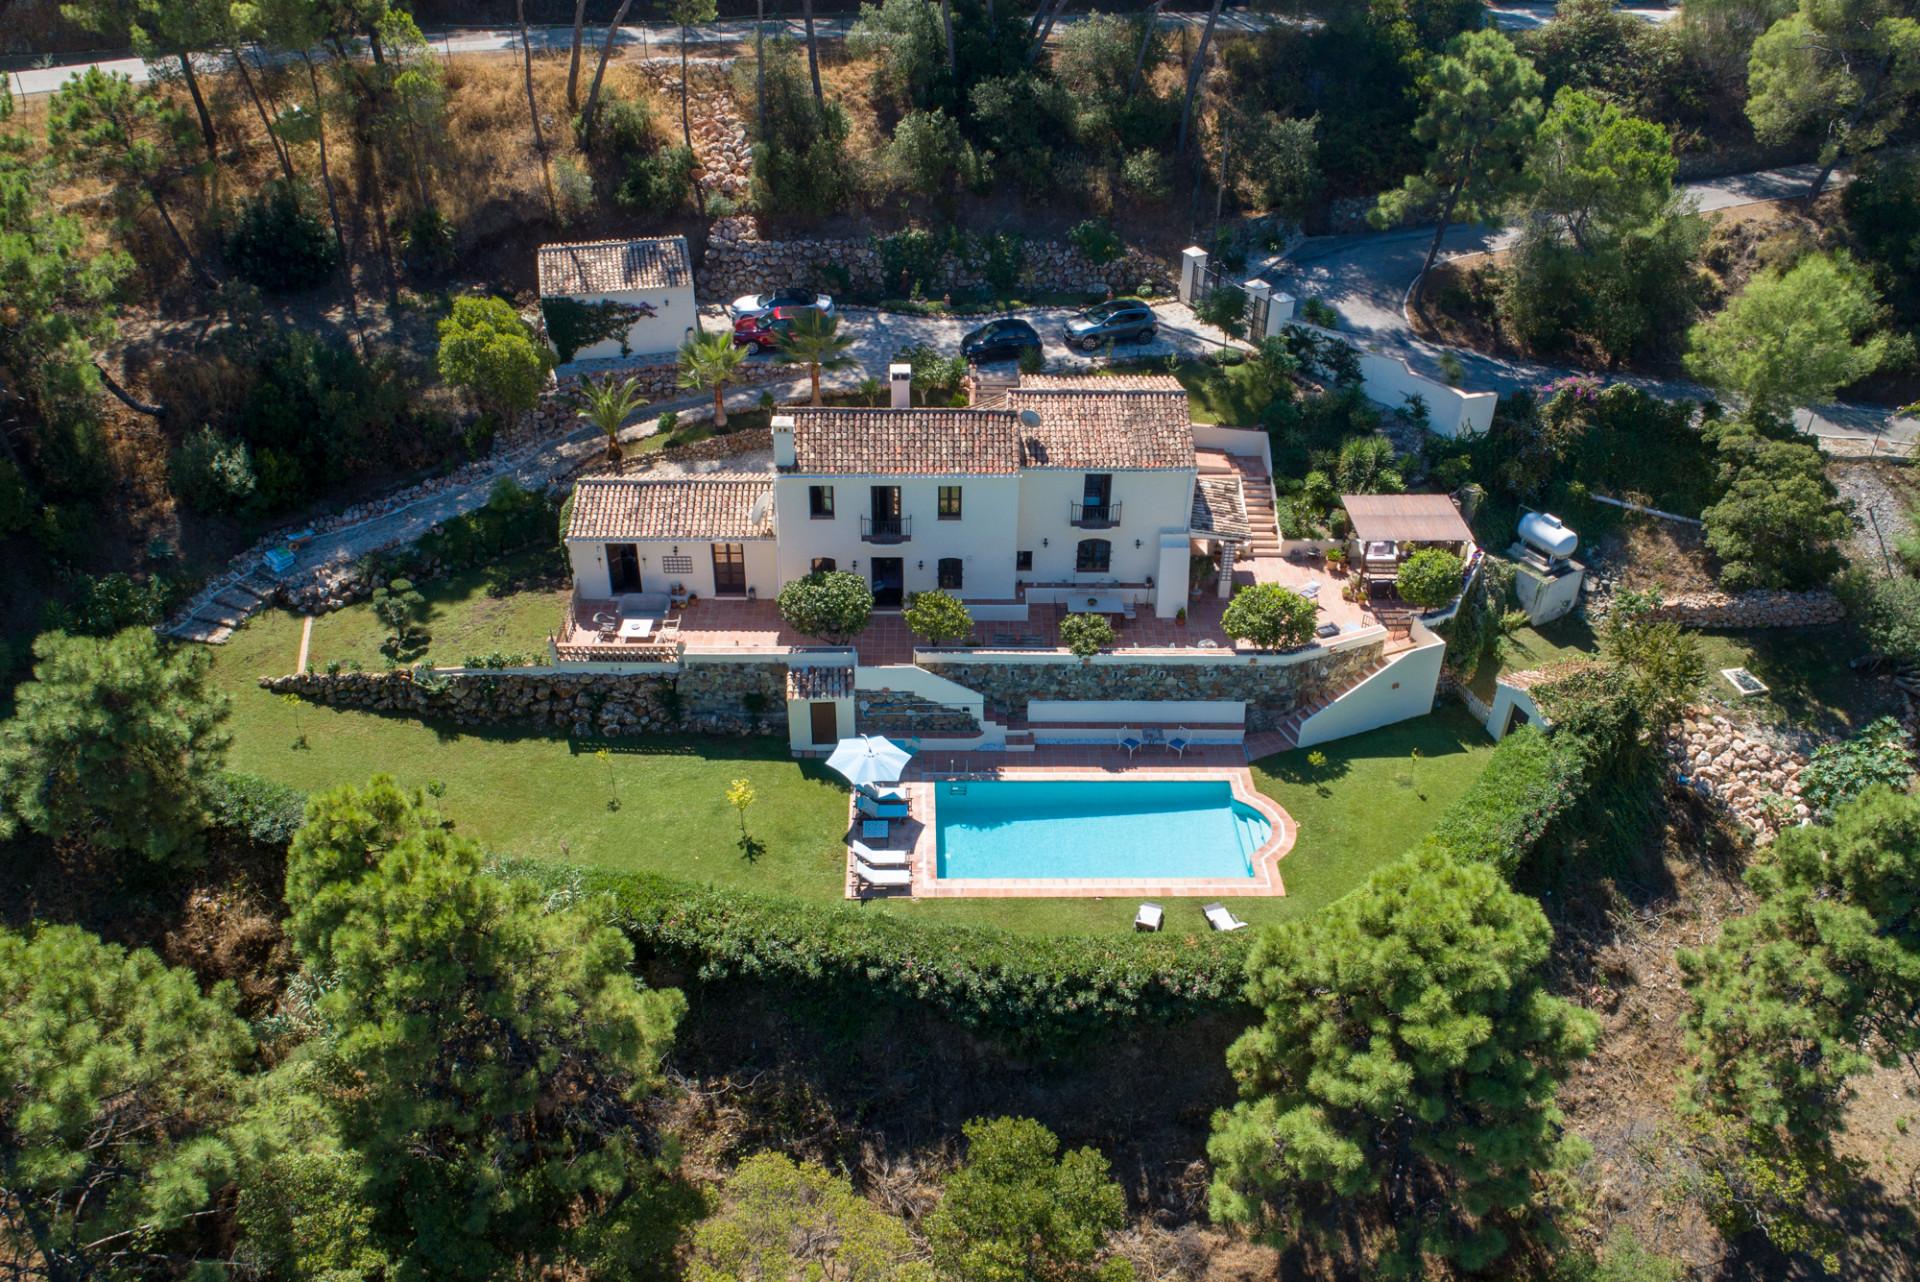 ARFV2094 - Villa im Landhausstil zum Verkauf in El Madroñal in Bneahvis